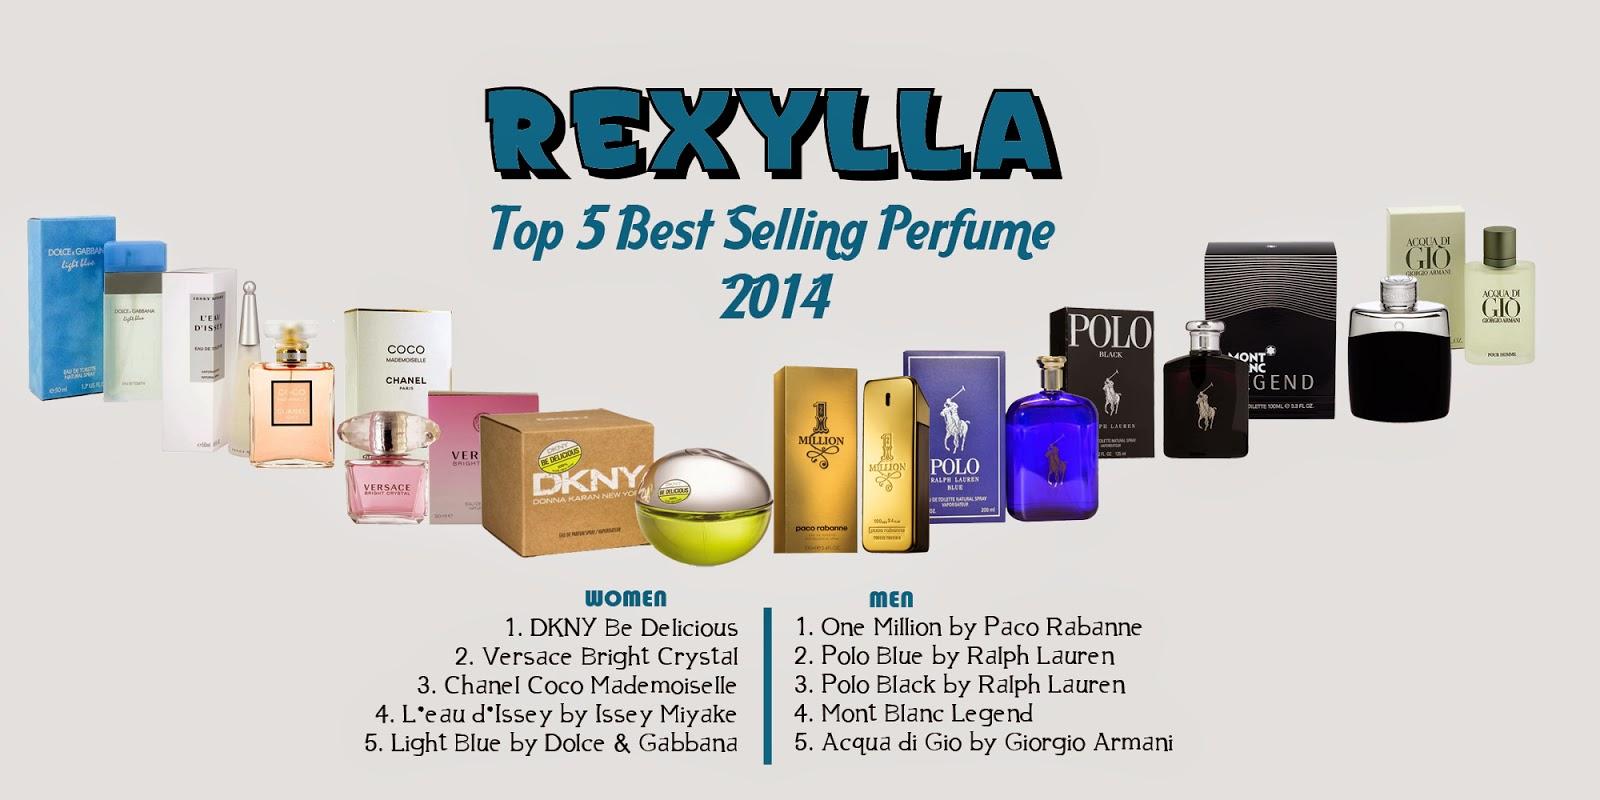 rexylla, rexylla perfume, best selling perfume 2014